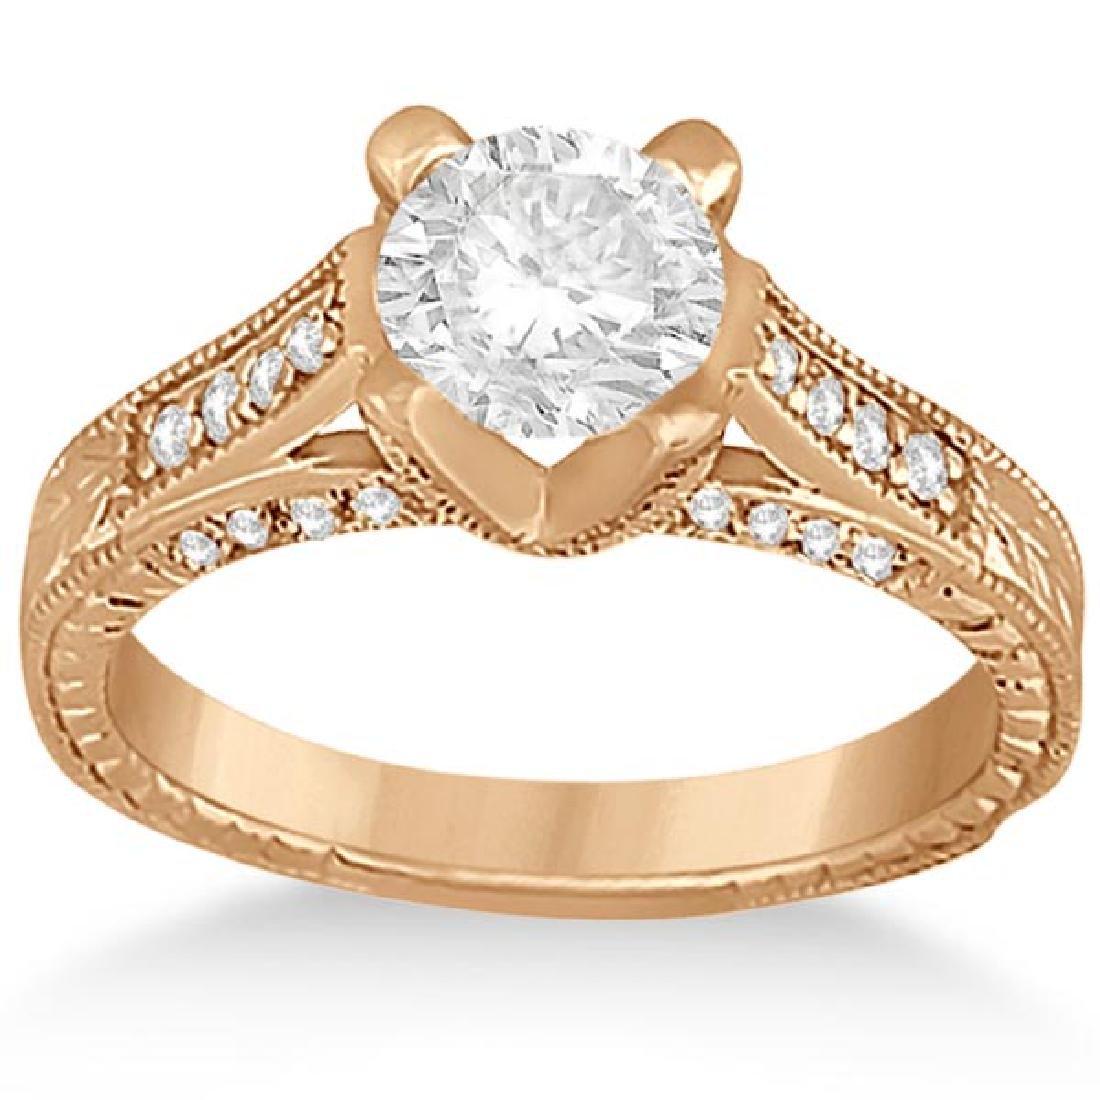 Antique Style Diamond Engagement Ring 14k Rose (0.90ct)